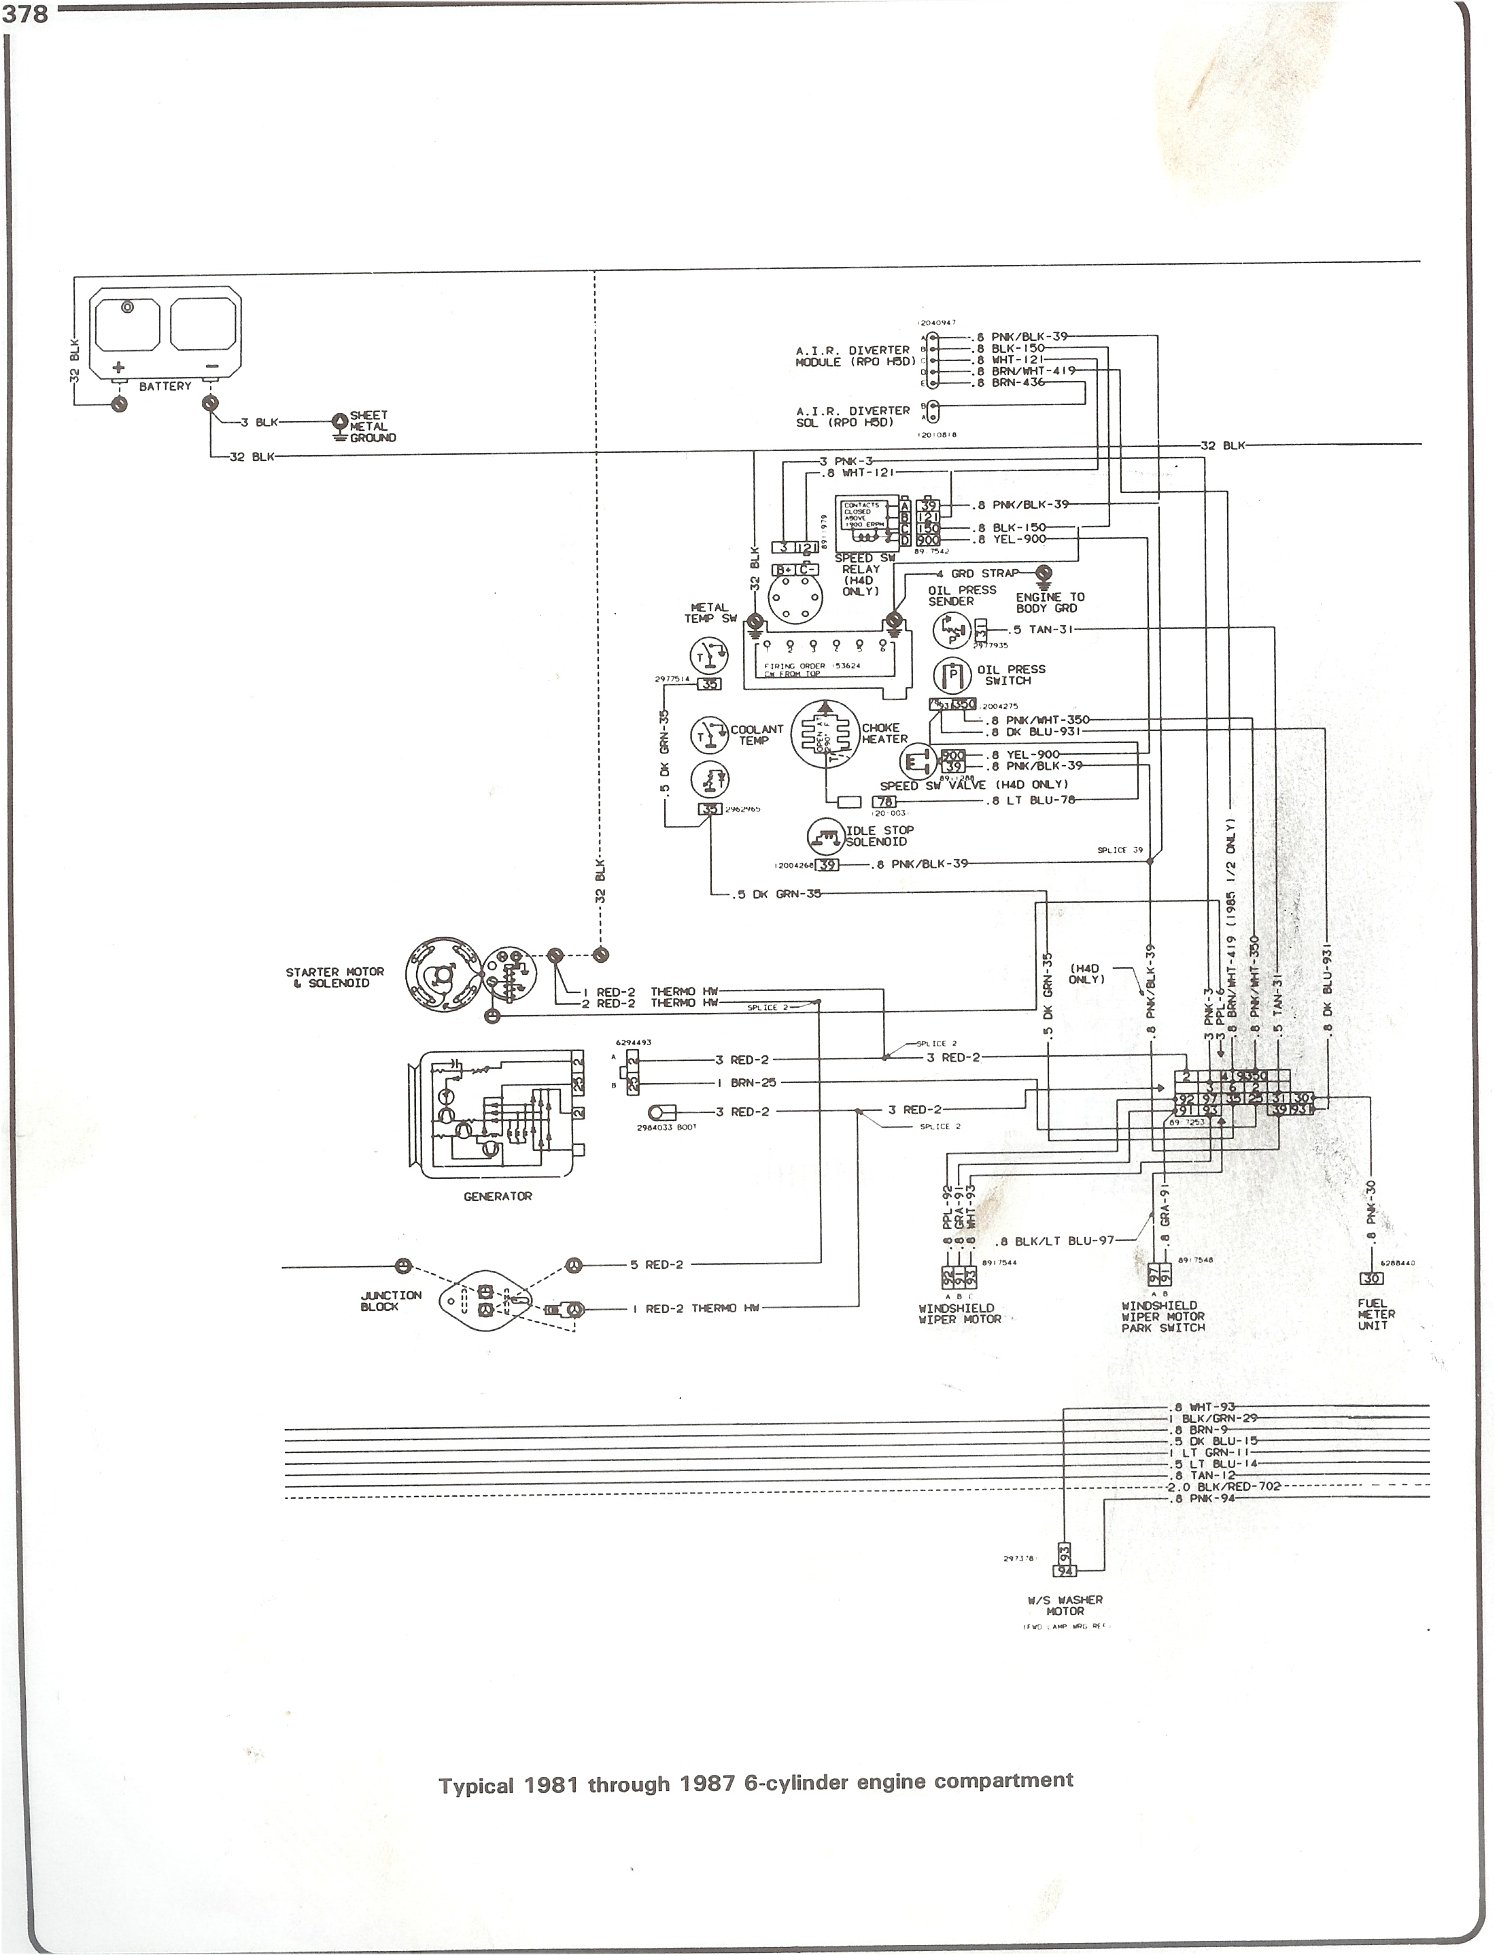 chevy vega wiring diagram fl 8499  72 chevy truck wiring diagram chevy truck wiring diagram  72 chevy truck wiring diagram chevy